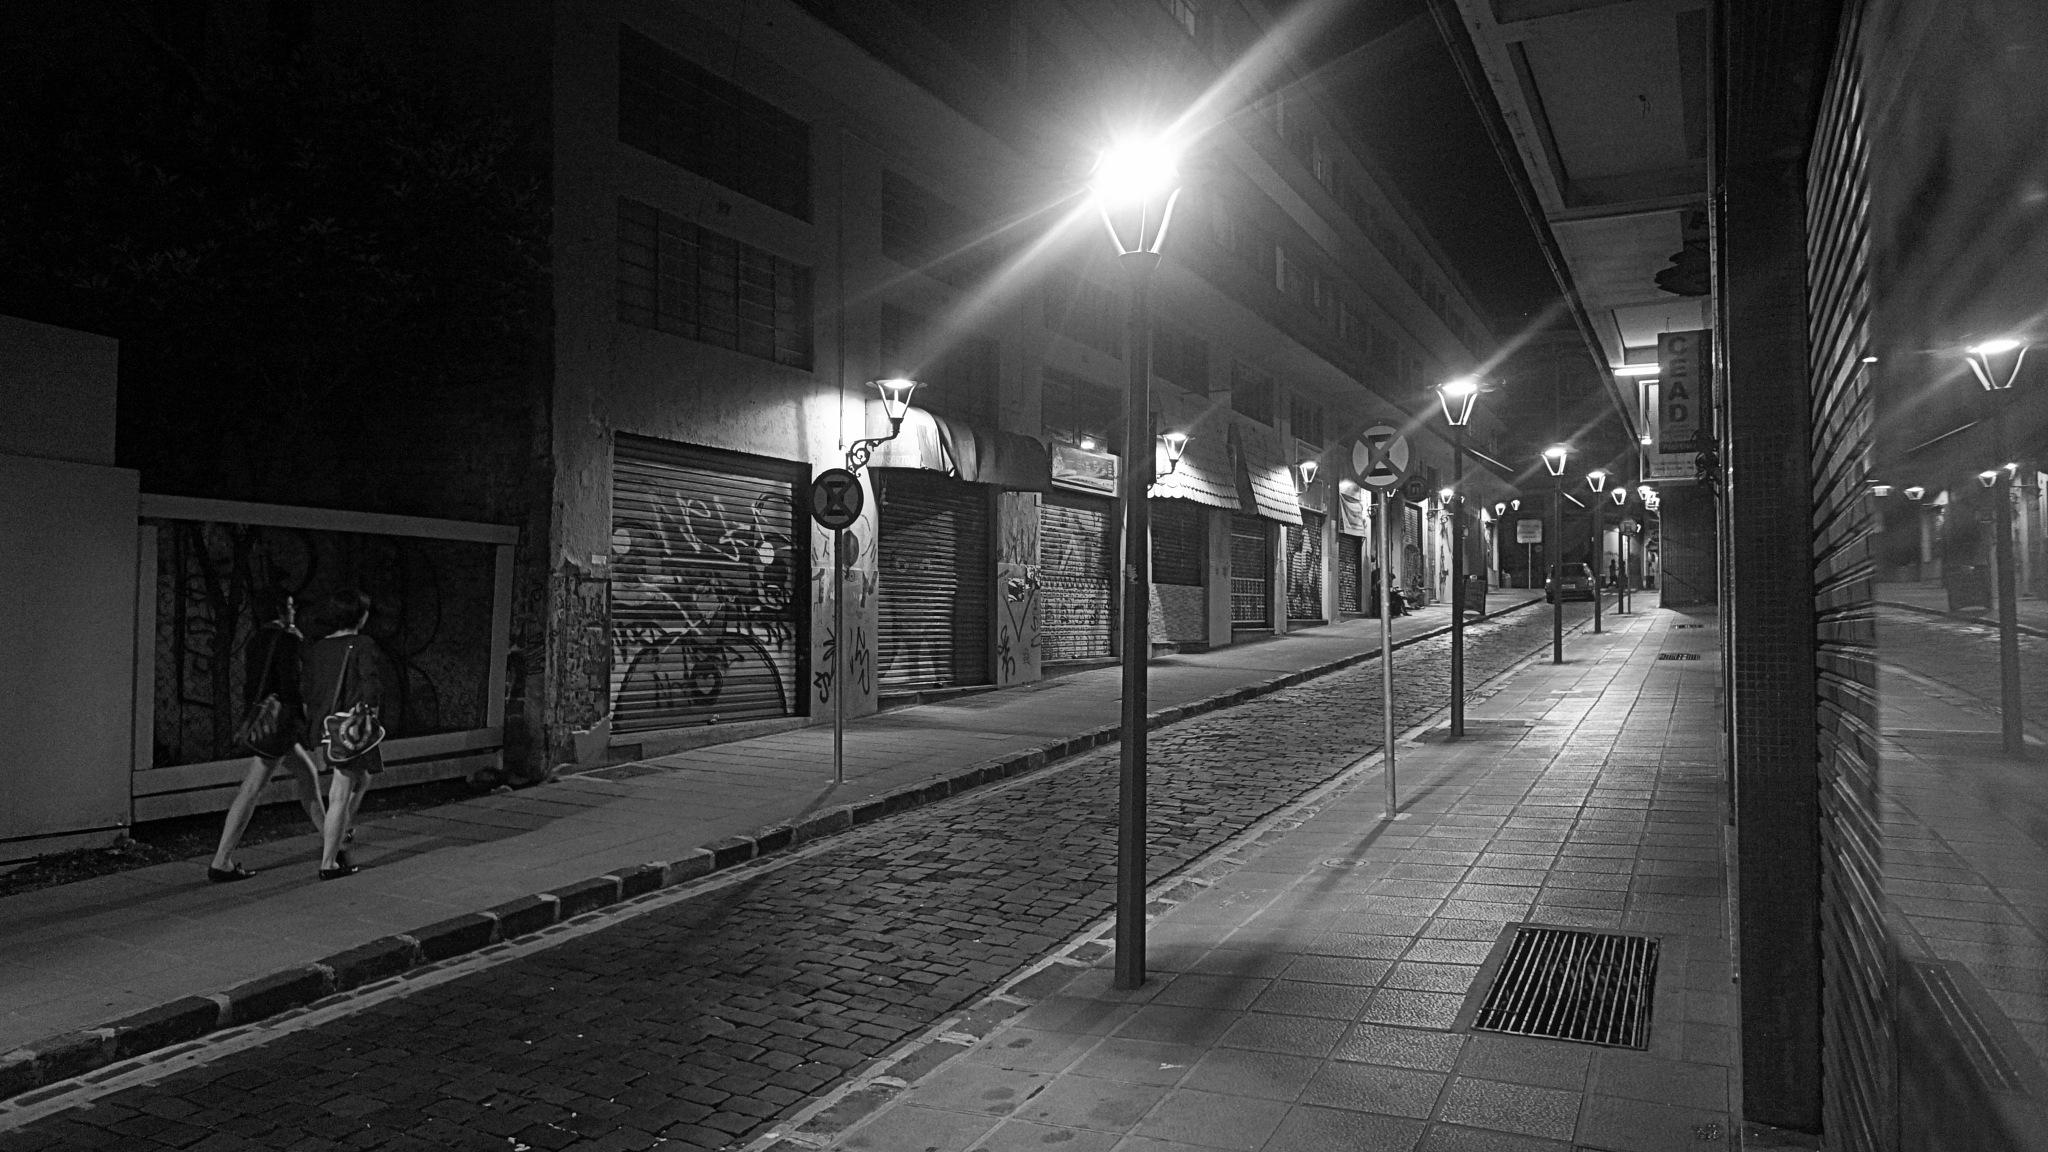 CWB's Nights by José Evaldo Suassuna de Oliveira